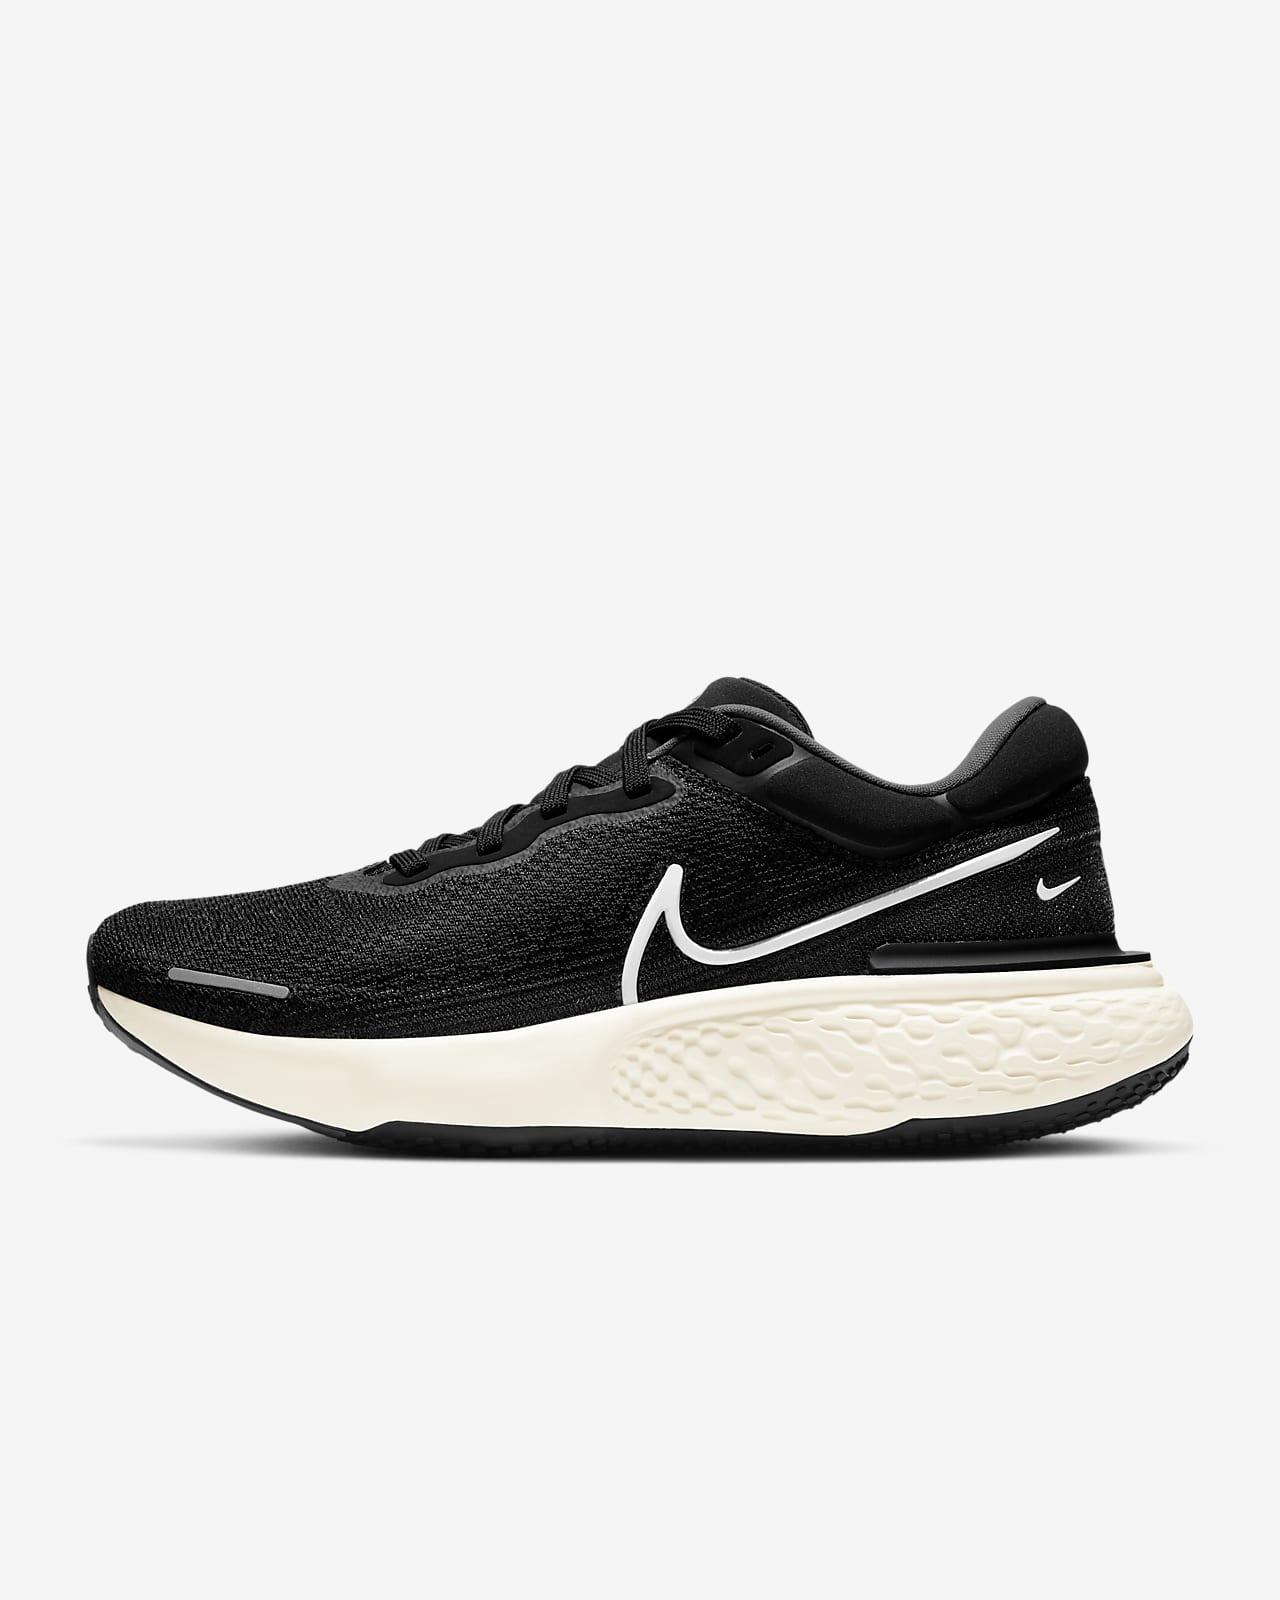 Męskie buty do biegania Nike ZoomX Invincible Run Flyknit